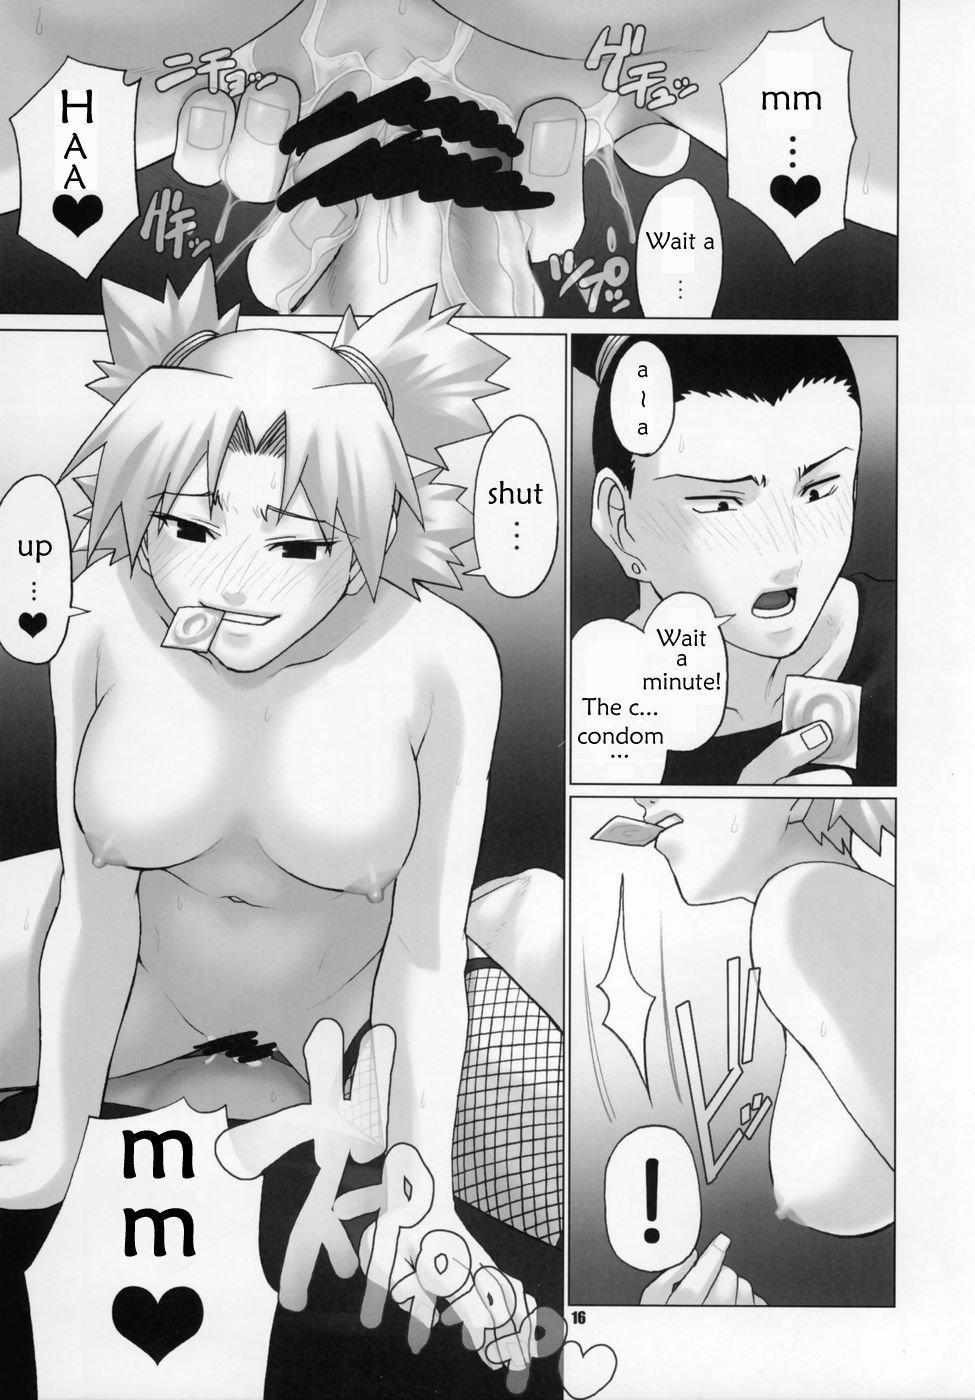 Himitsu - The Secret 16